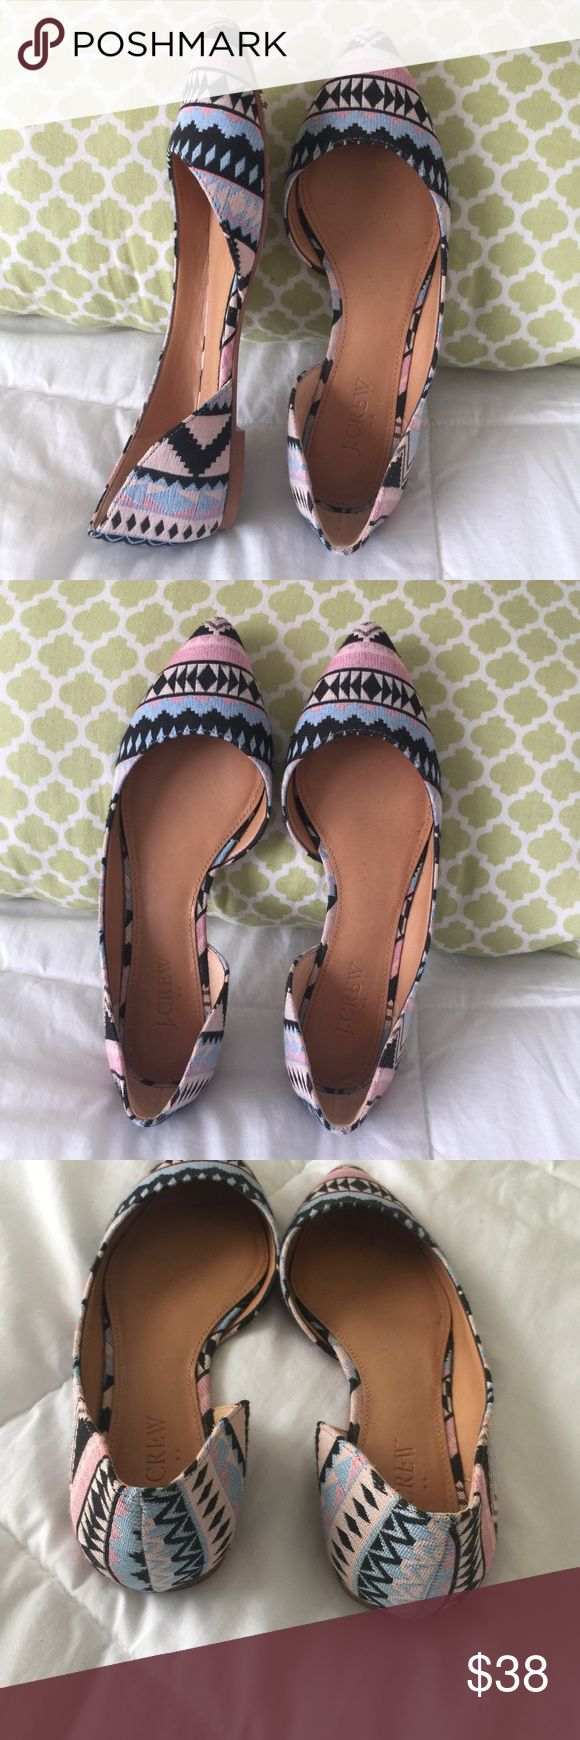 JCrew Aztec flats size 7 Worn once // EUC // Aztec print flats // leather sole // style # E8105 J. Crew Shoes Flats & Loafers